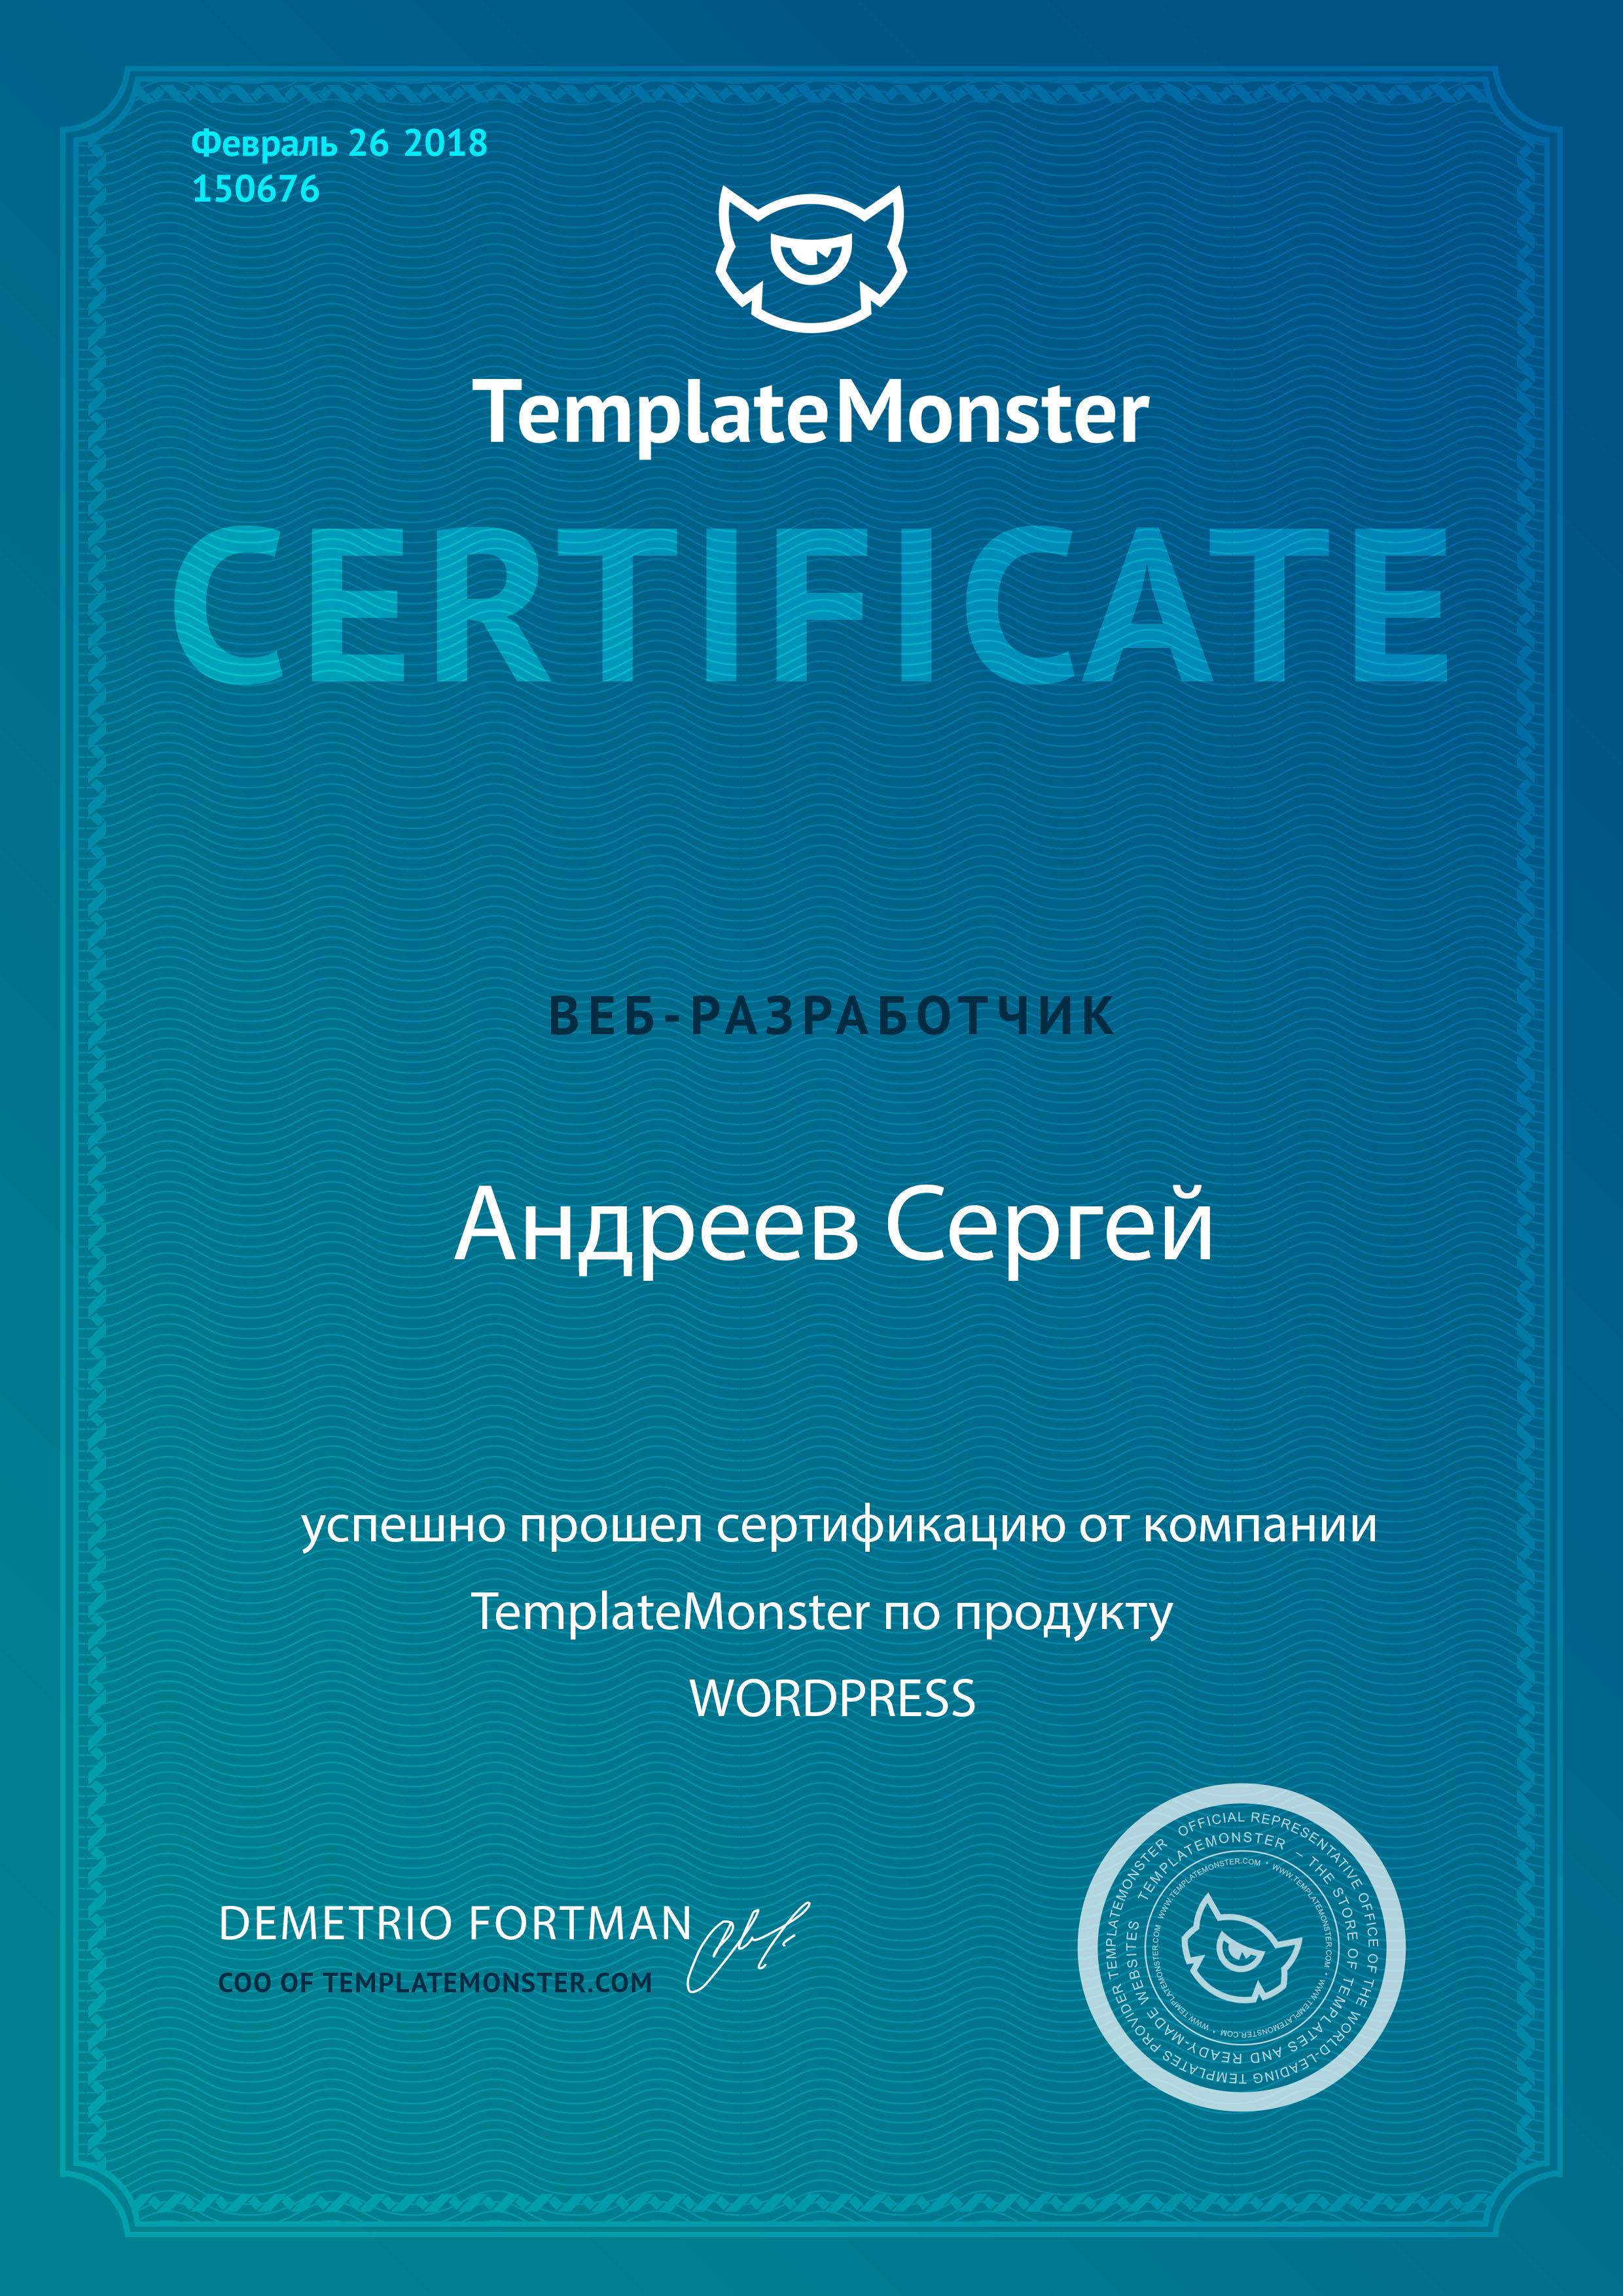 2018 г. - Сертификат разработчика wordpress.